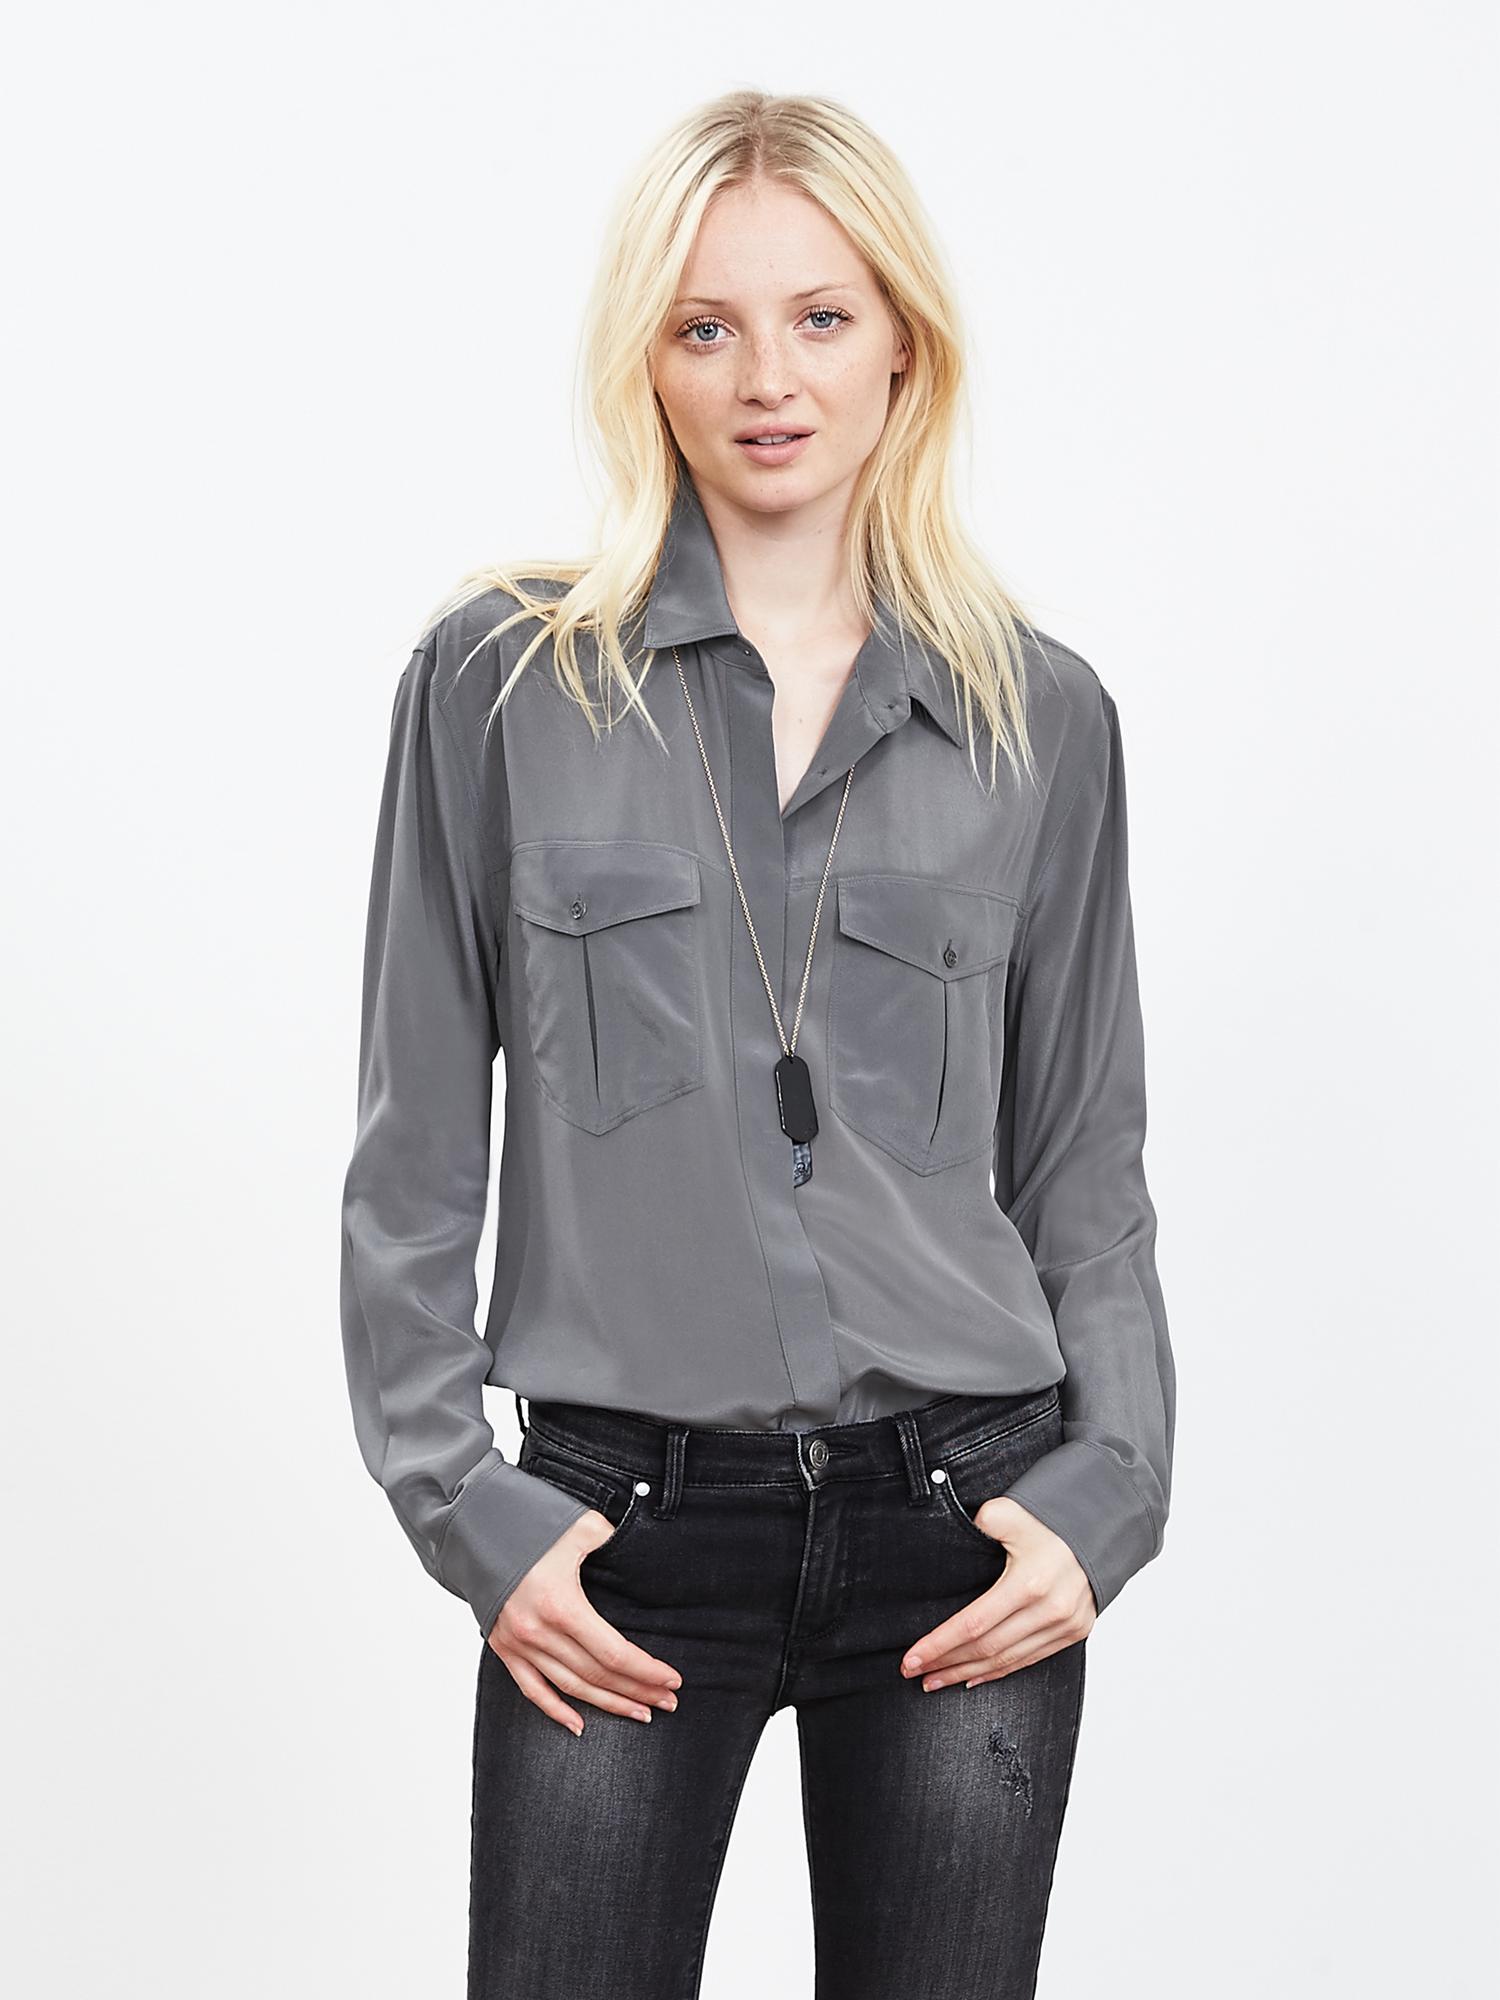 91a720435d11c Lyst - Banana Republic Silk Utility Shirt in Gray